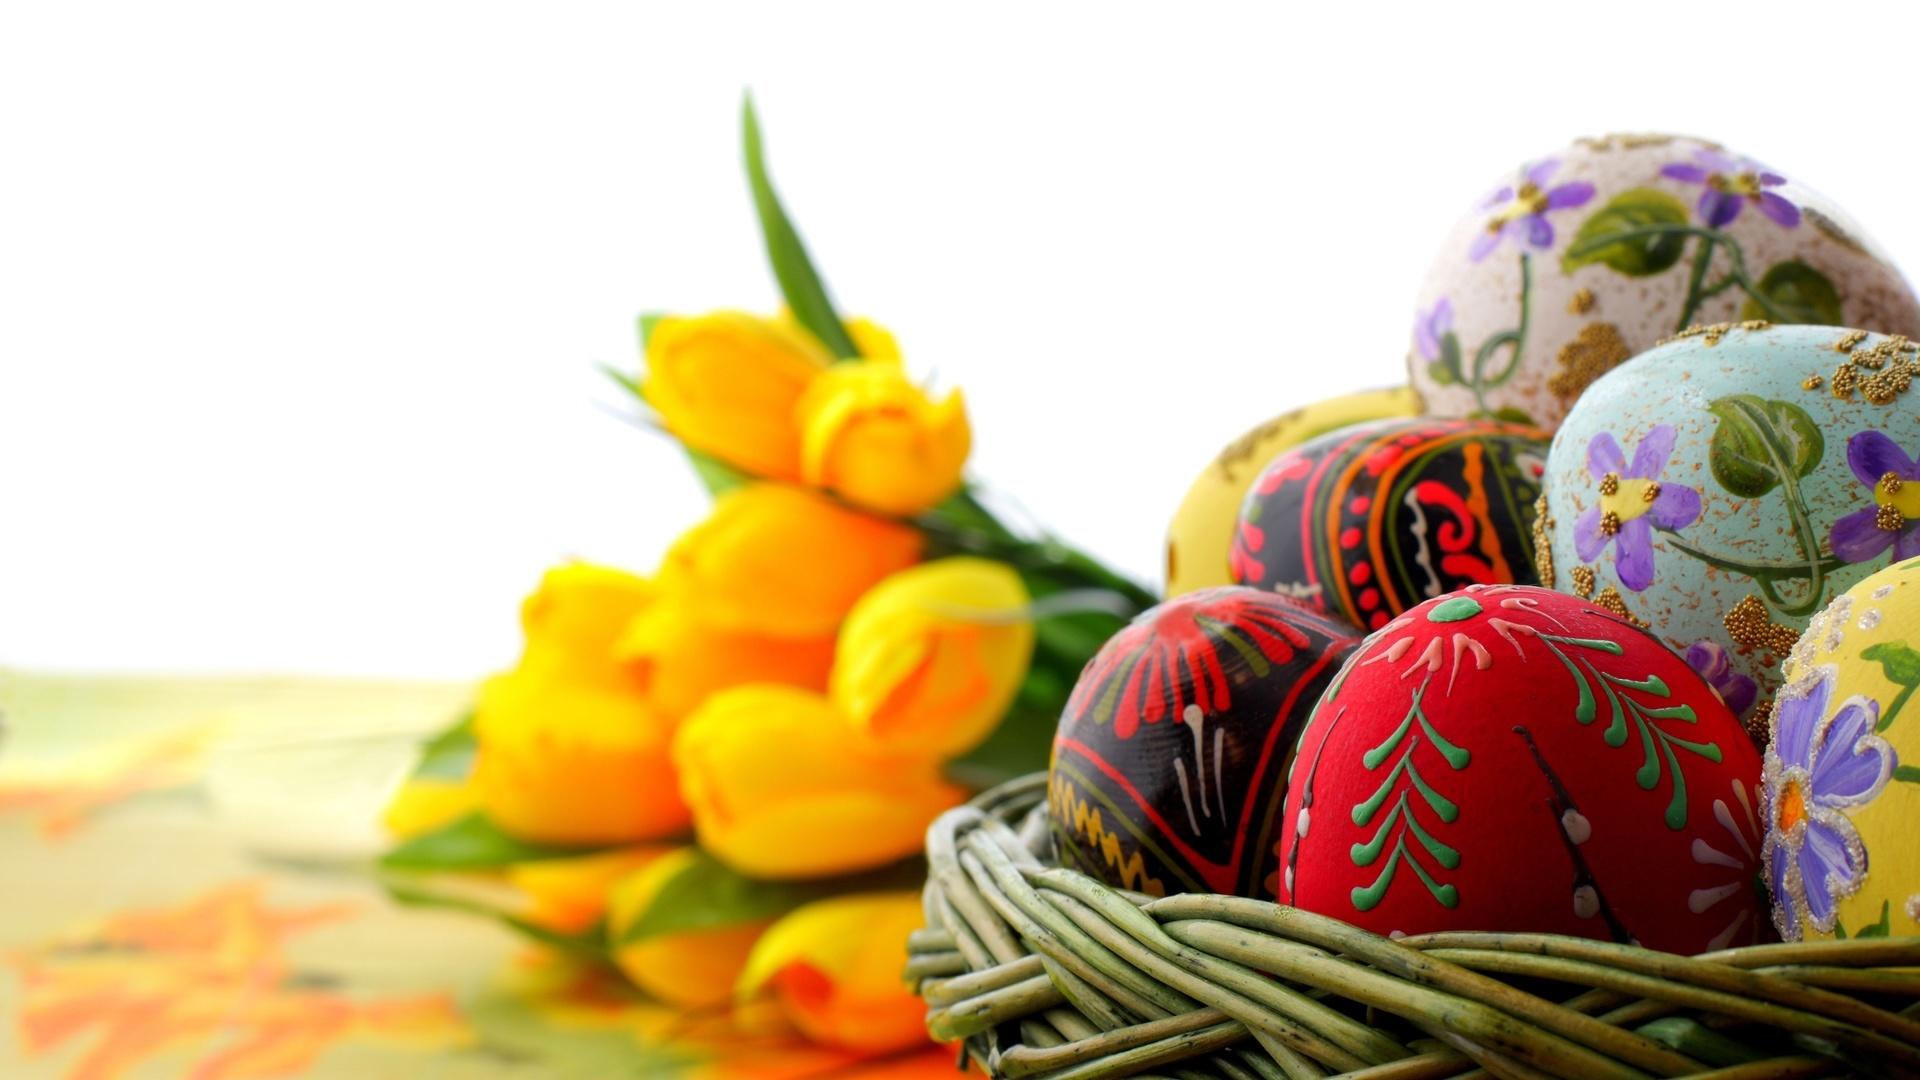 22195 descargar fondo de pantalla Vacaciones, Flores, Huevos, Pascua: protectores de pantalla e imágenes gratis